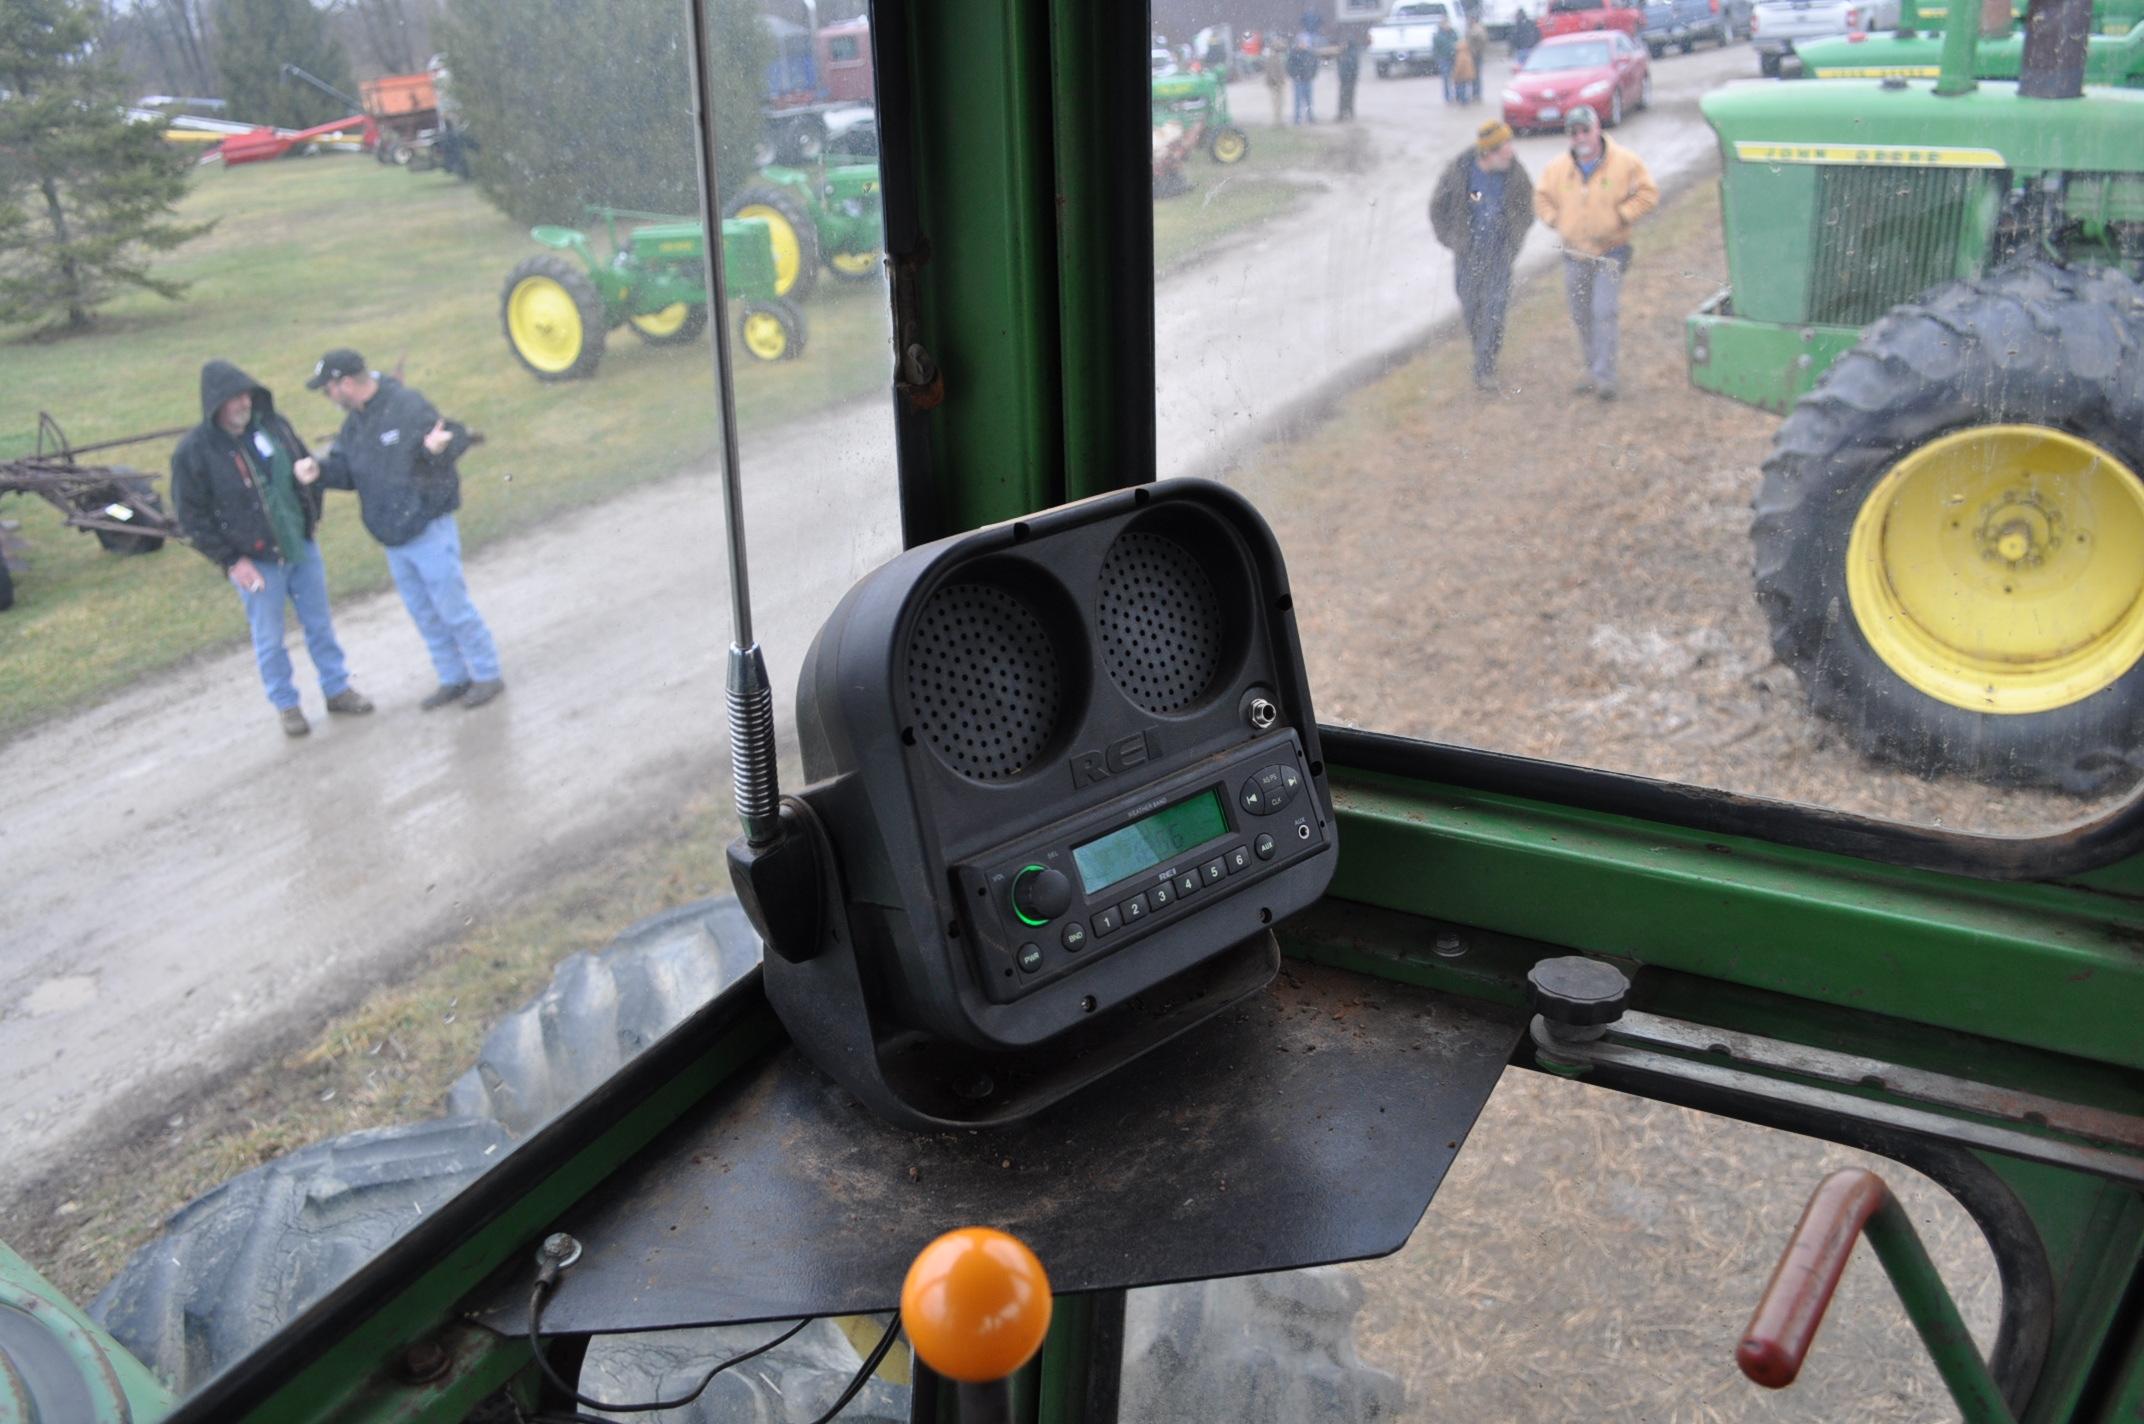 John Deere 7520 tractor, 4WD, diesel, 18.4-34 duals, original fenders, CHA, cab interior kit, 3 - Image 24 of 24